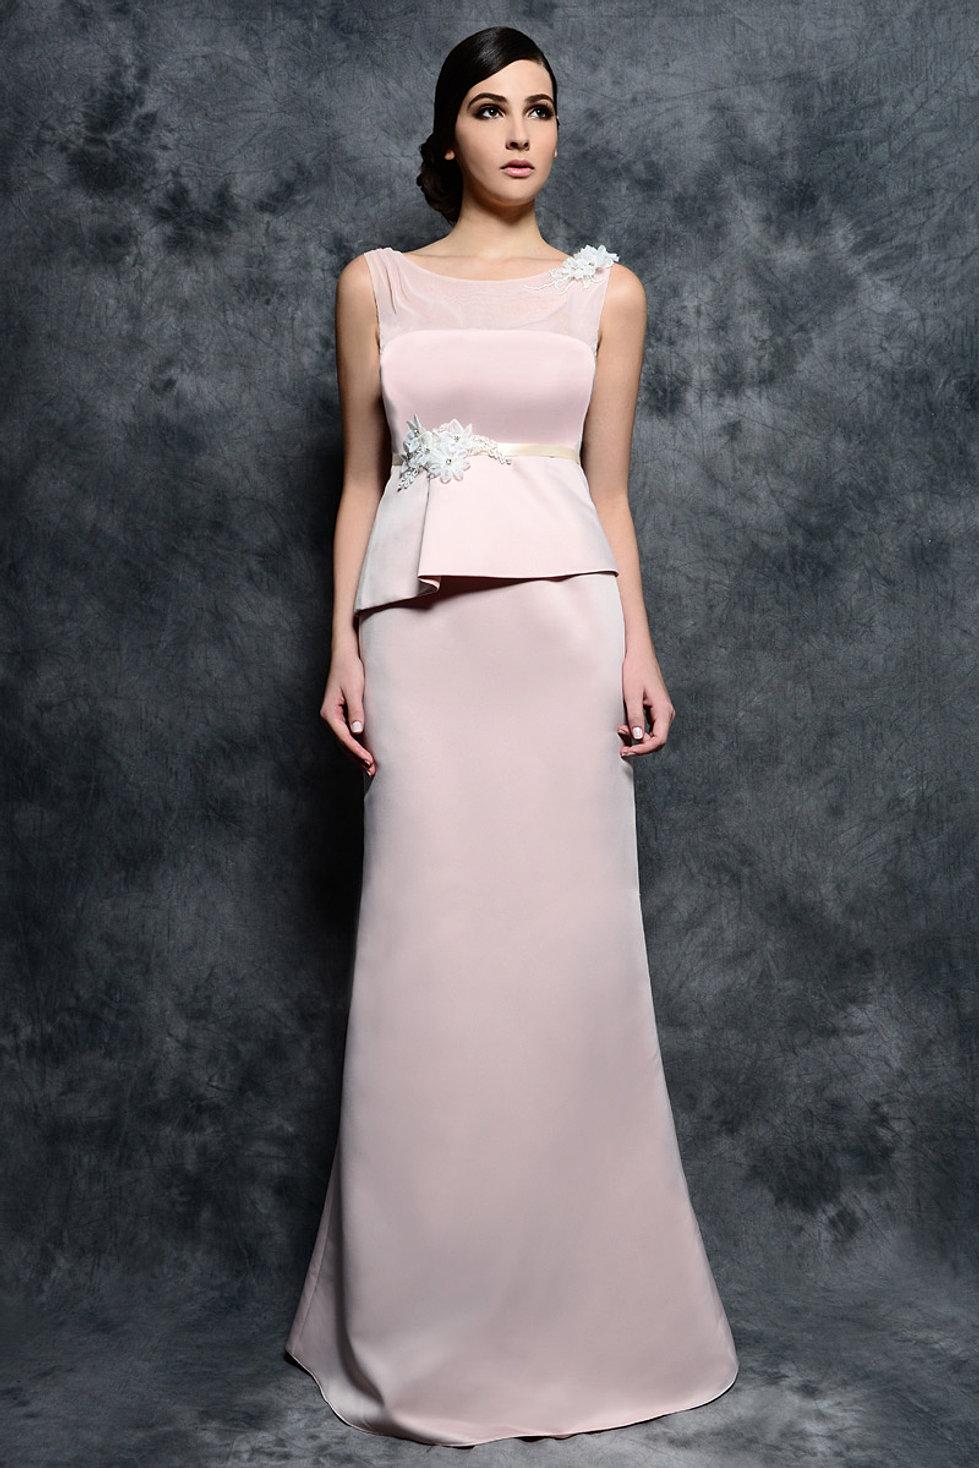 Elyse&39s Boutique Bridal &amp Prom